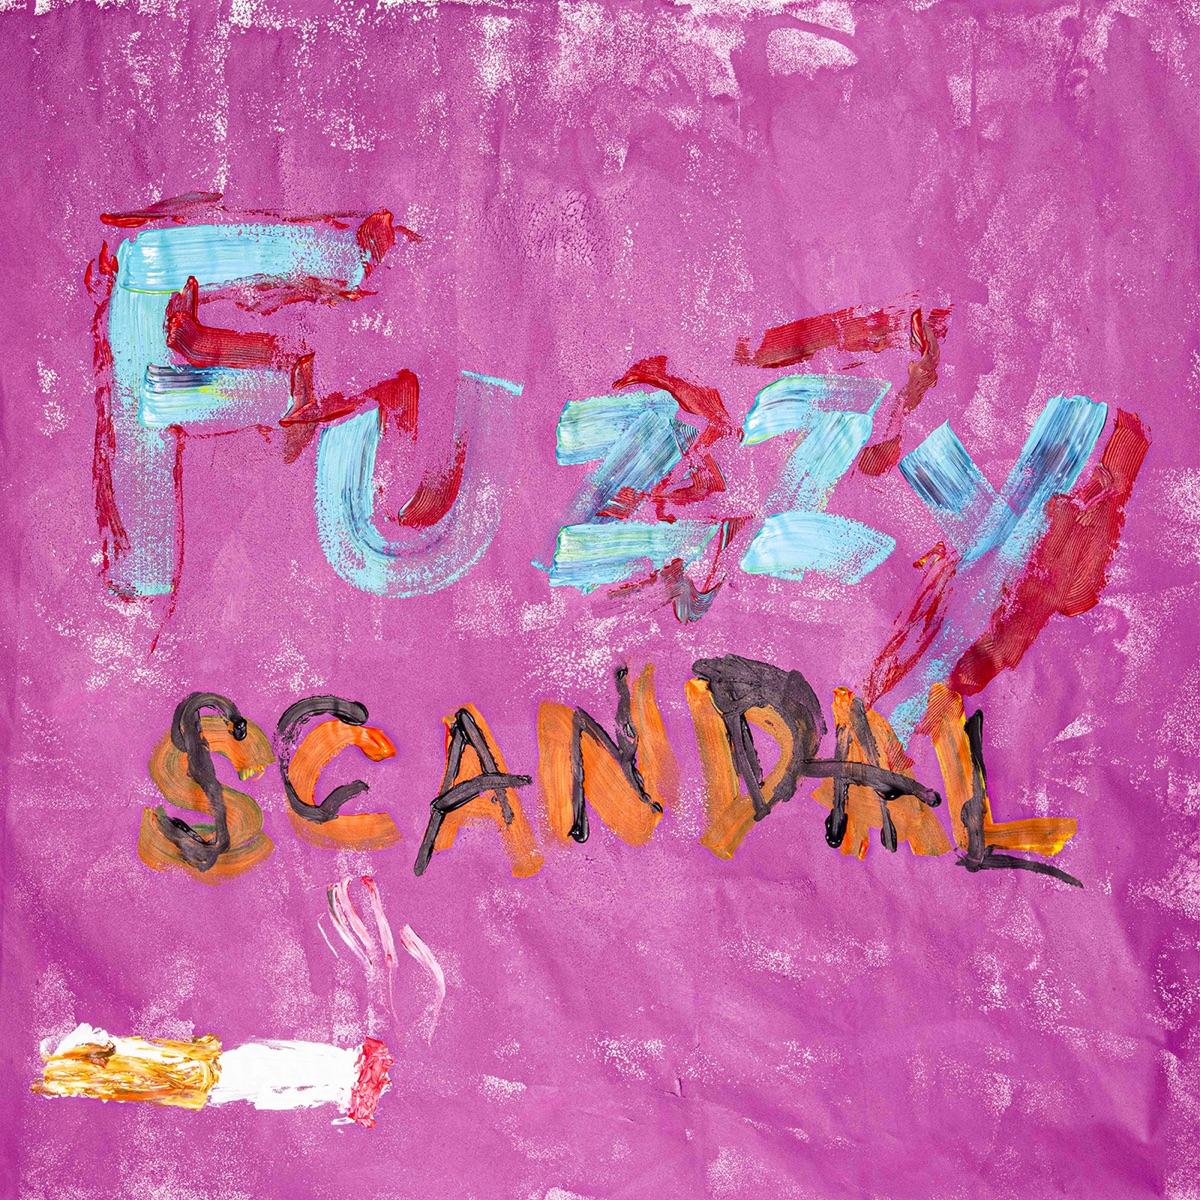 『SCANDAL - Fuzzy』収録の『Fuzzy』ジャケット